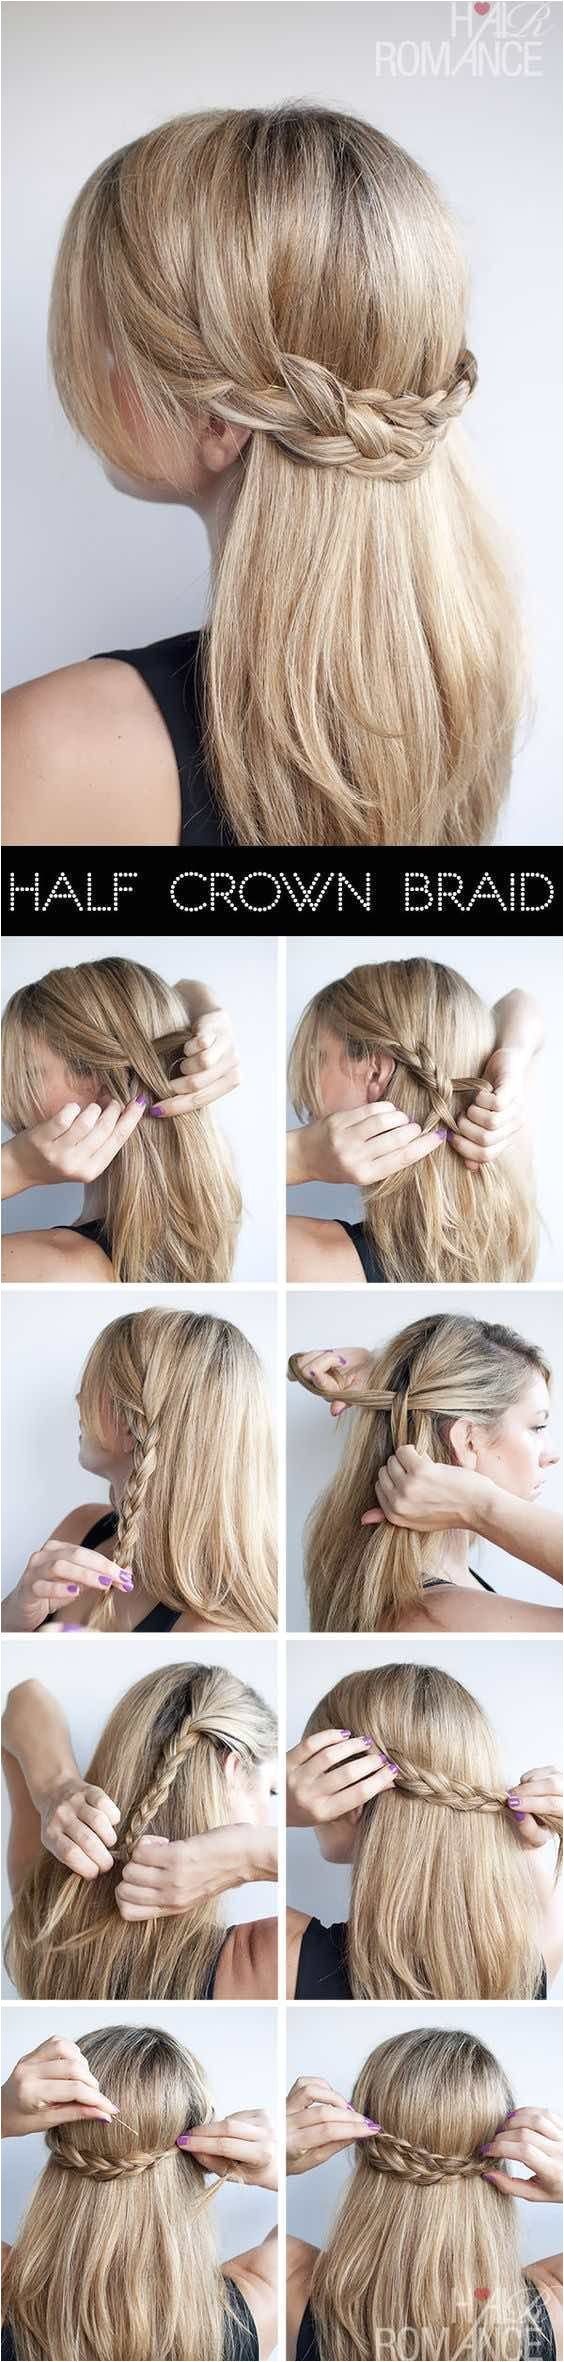 Hair Romance Half crown braid half up half down wedding hairstyle